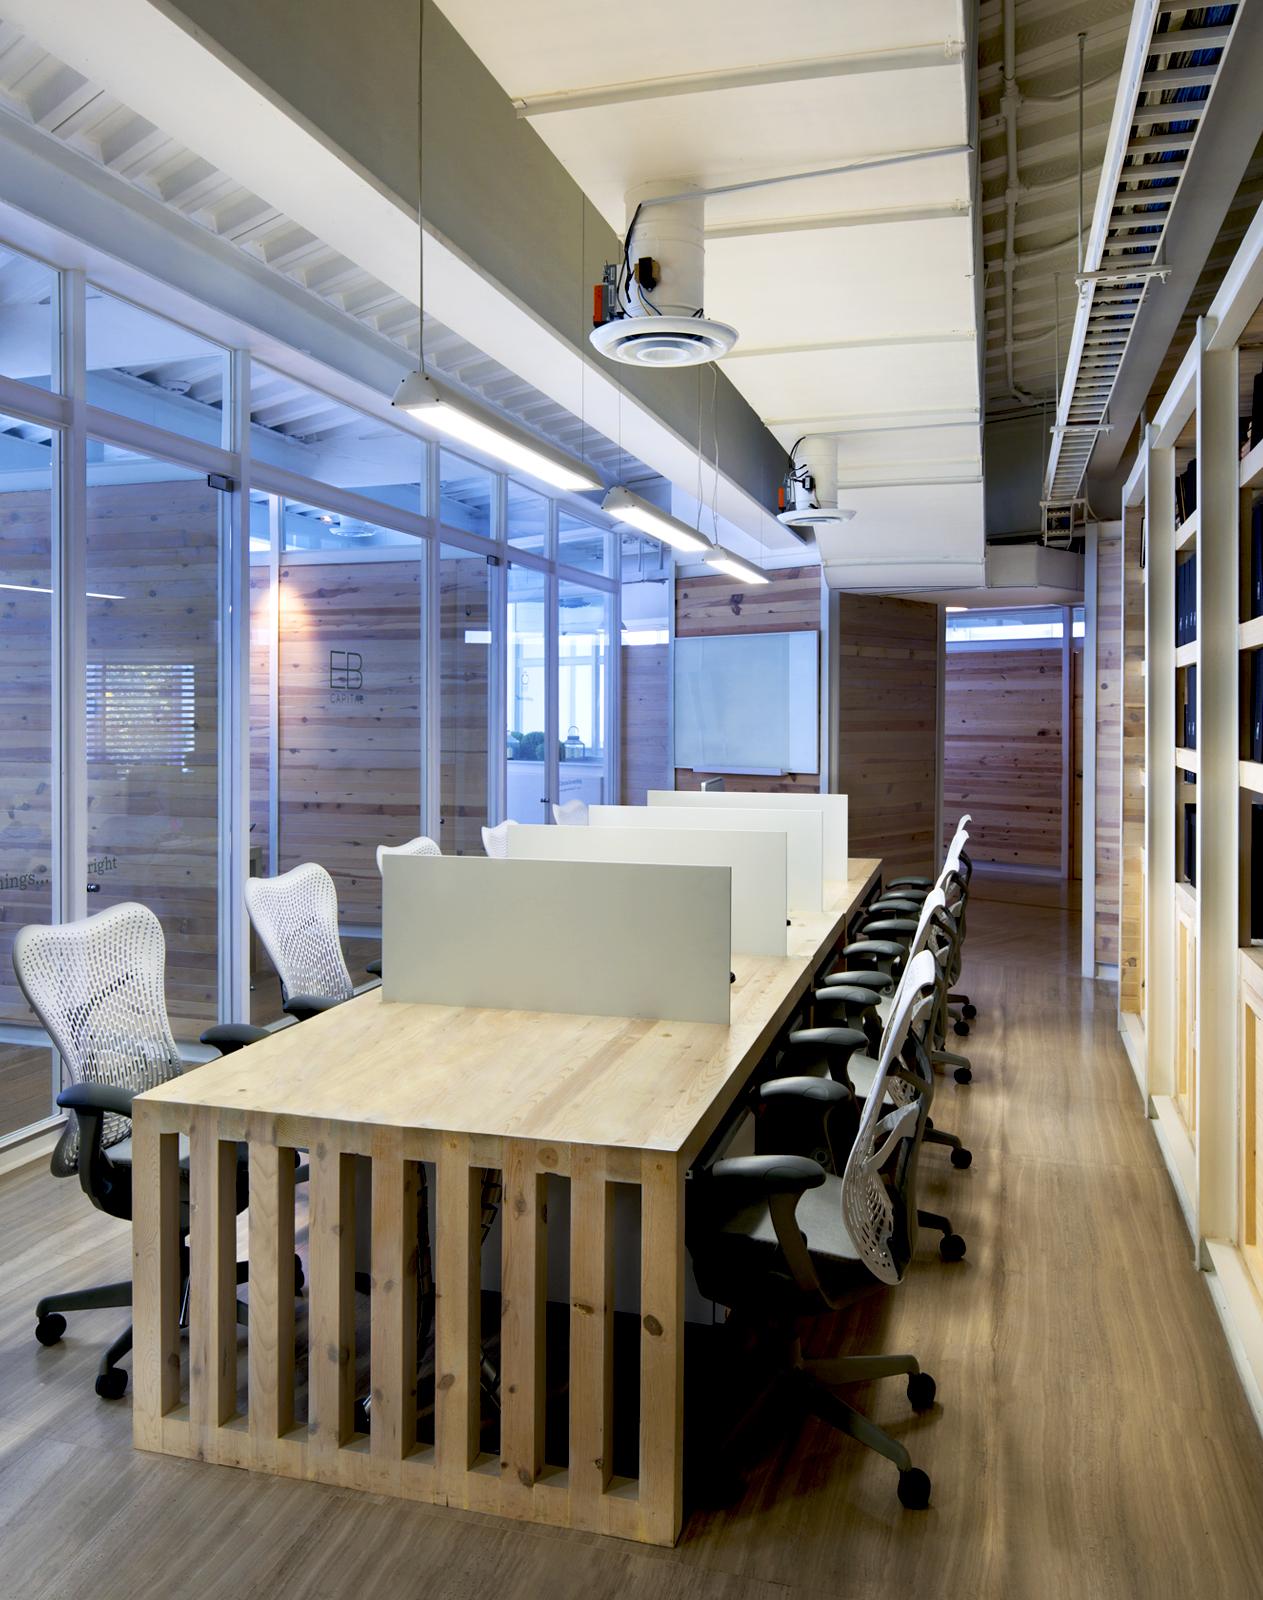 insignias-interiorismo-arquitectura-oficinas-tamarindo-madera-despacho-artigas-arquitectos-4